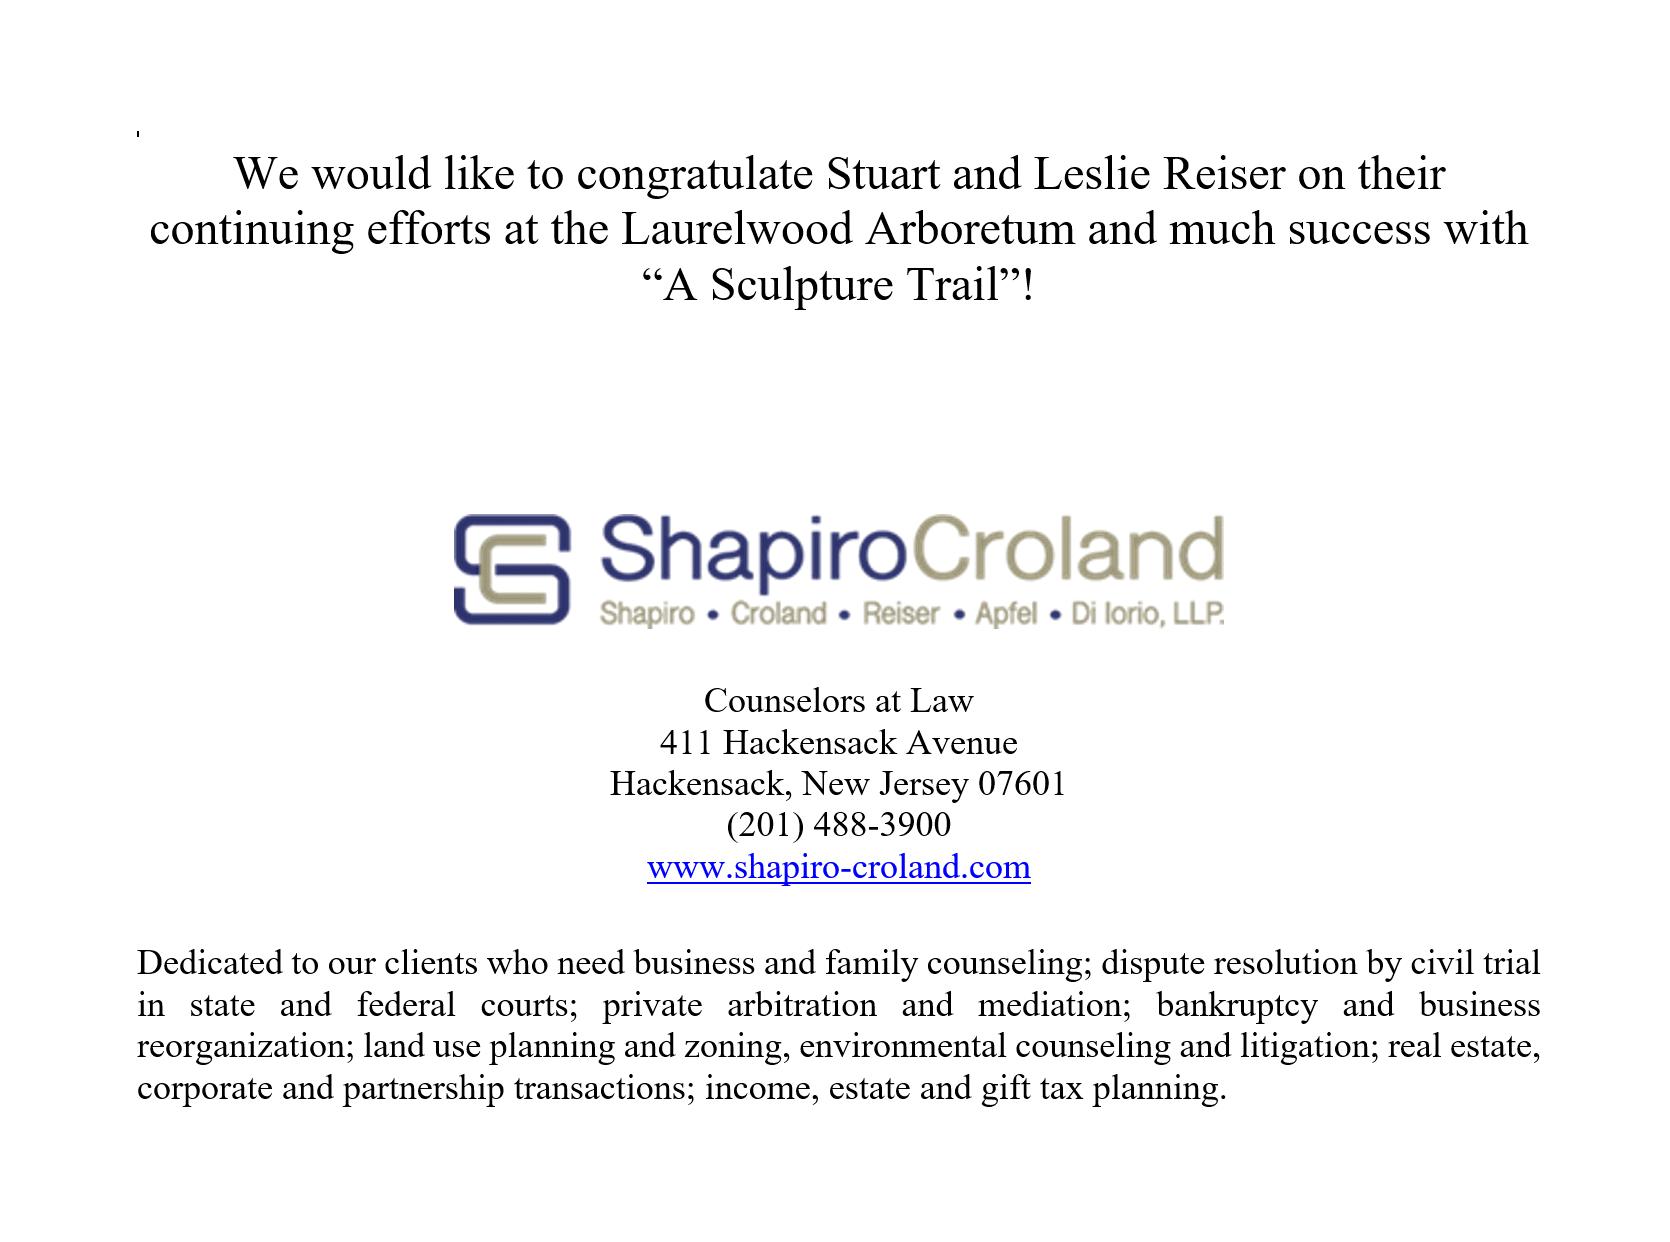 Shapiro Croland